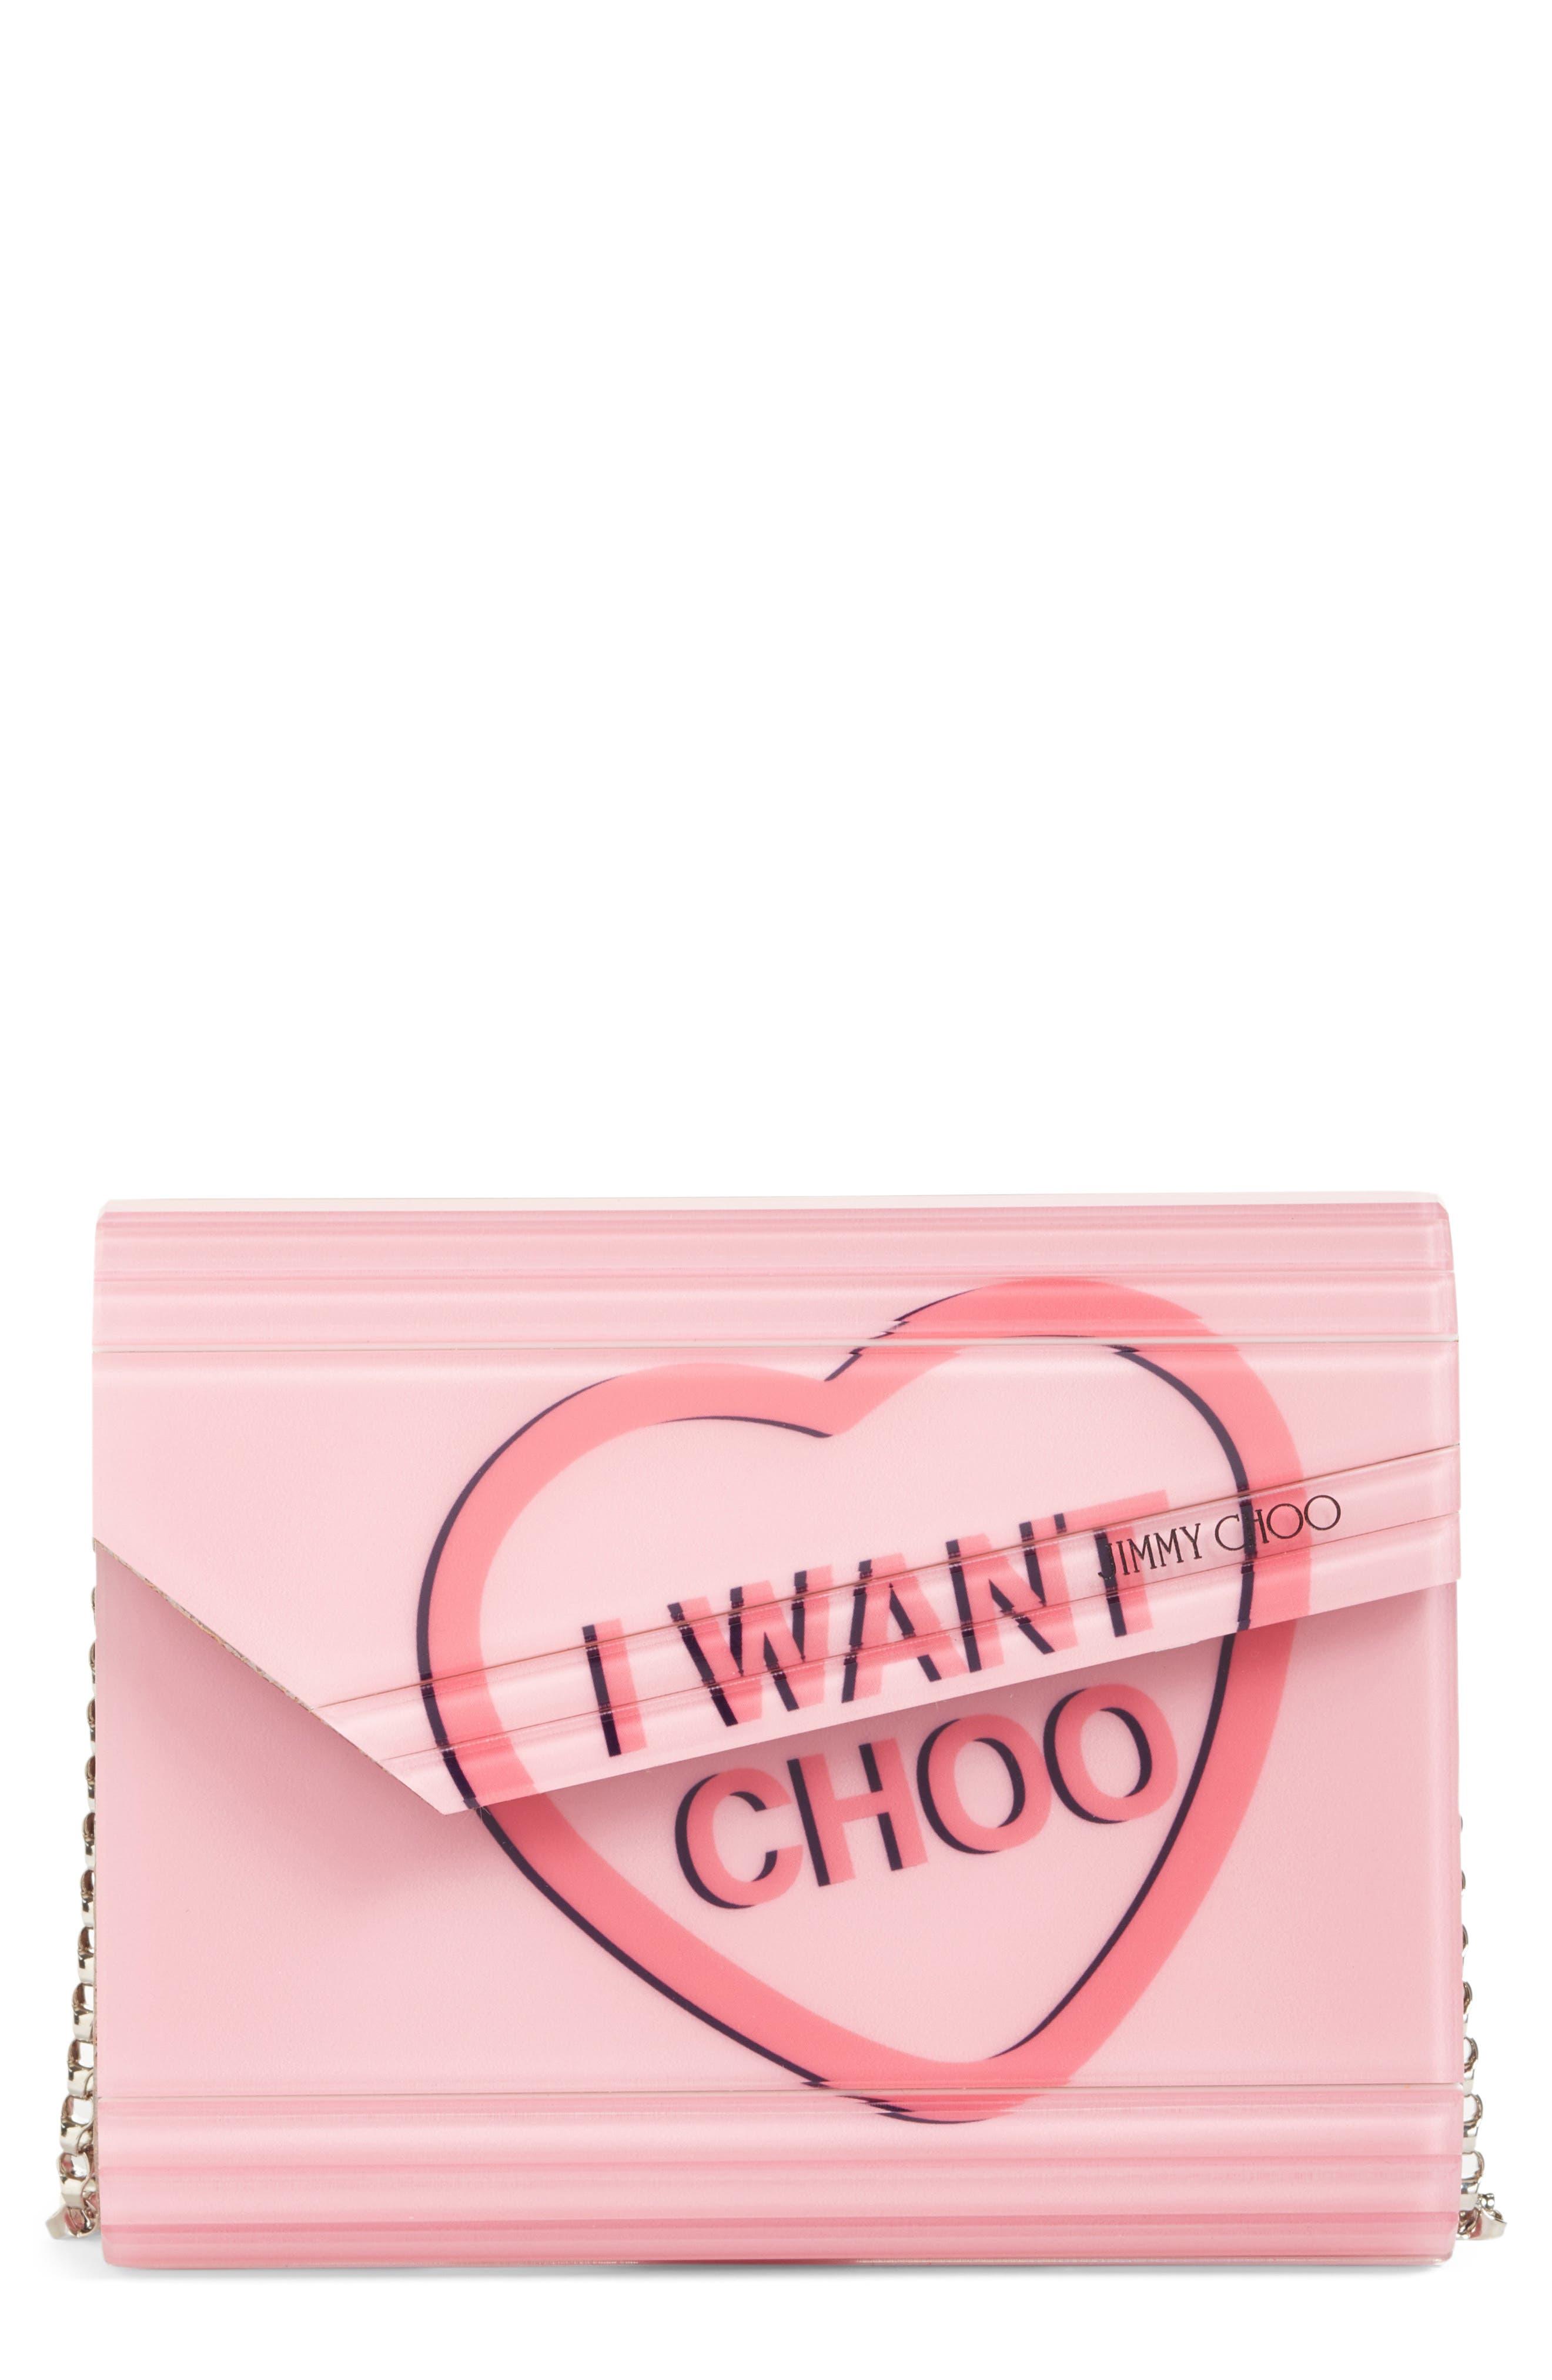 Main Image - Jimmy Choo Candy Love Heart Clutch